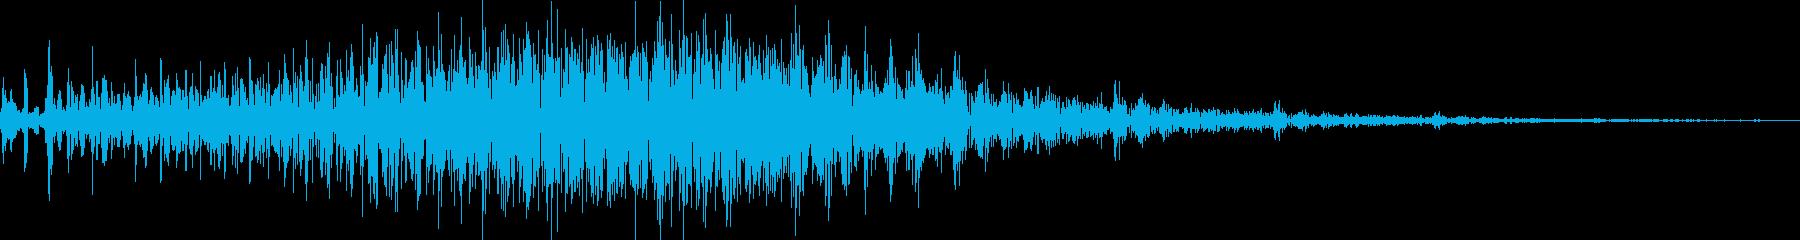 AMGアナログFX16の再生済みの波形